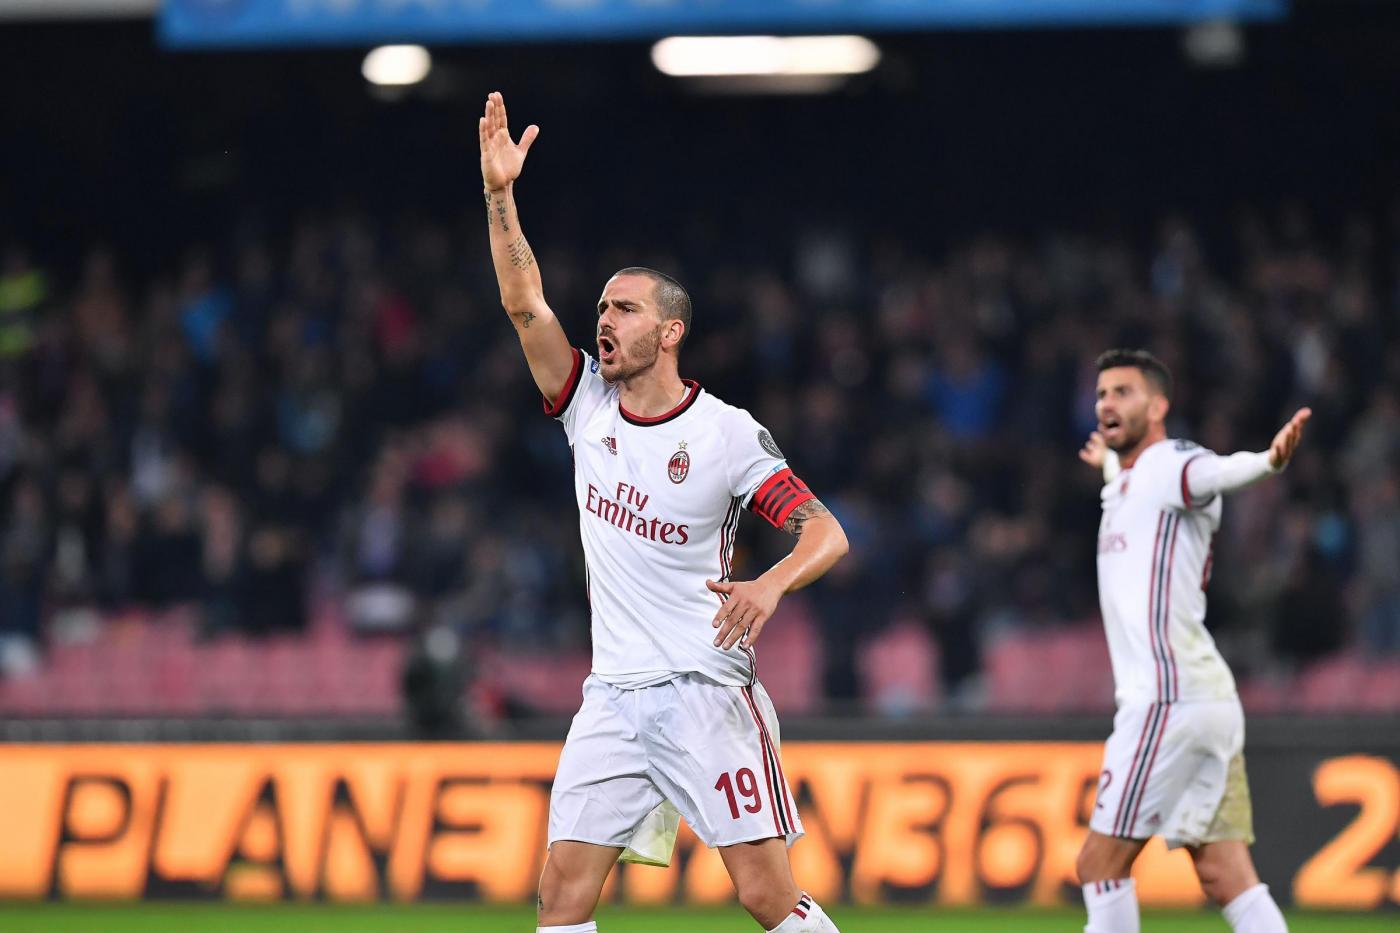 Italia, Cannavaro rifiuta la panchina: